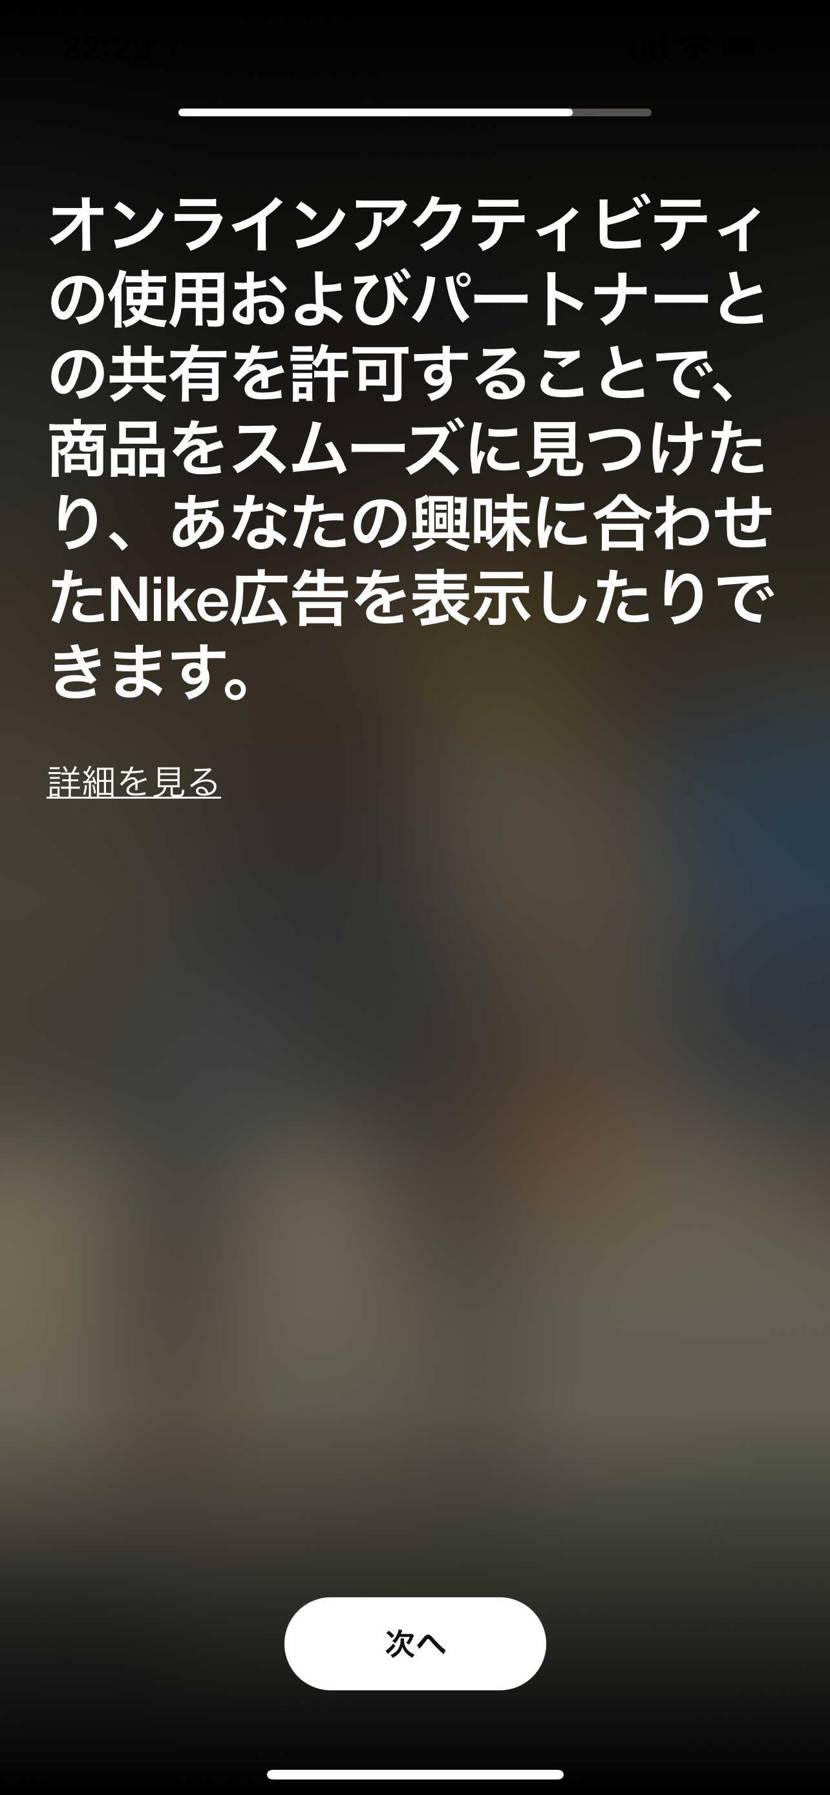 "NIKEアプリ開いたらこの画面になって、 ""次へ""を押しても全く反応せず進みま"